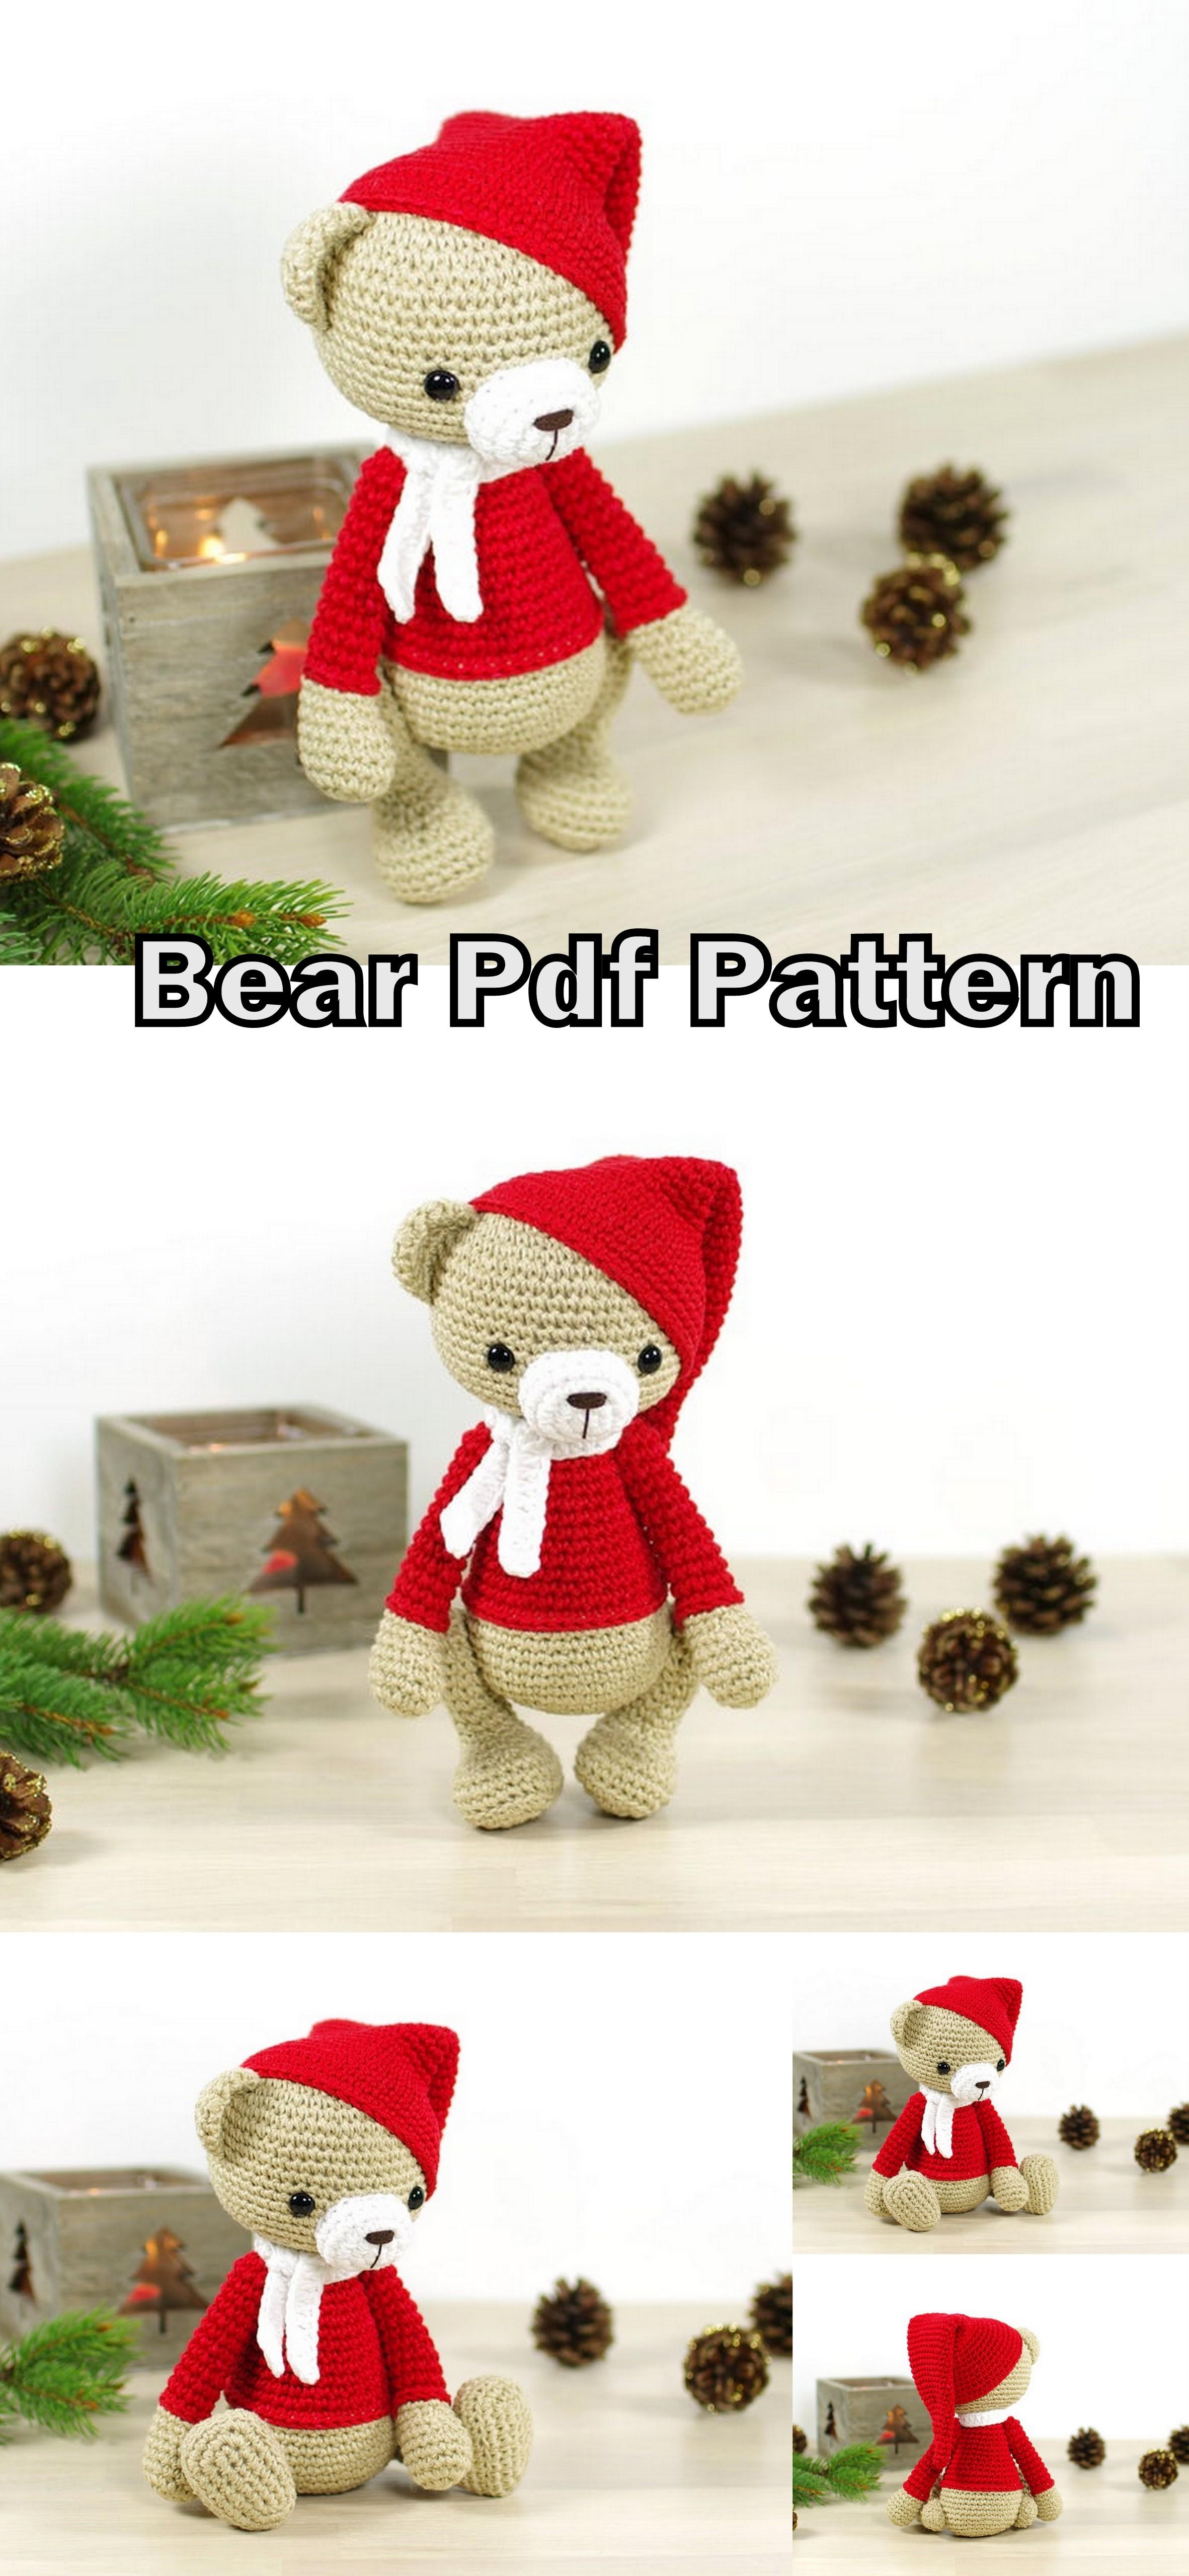 10 Best Amigurumi Teddy Bear Crochet Patterns